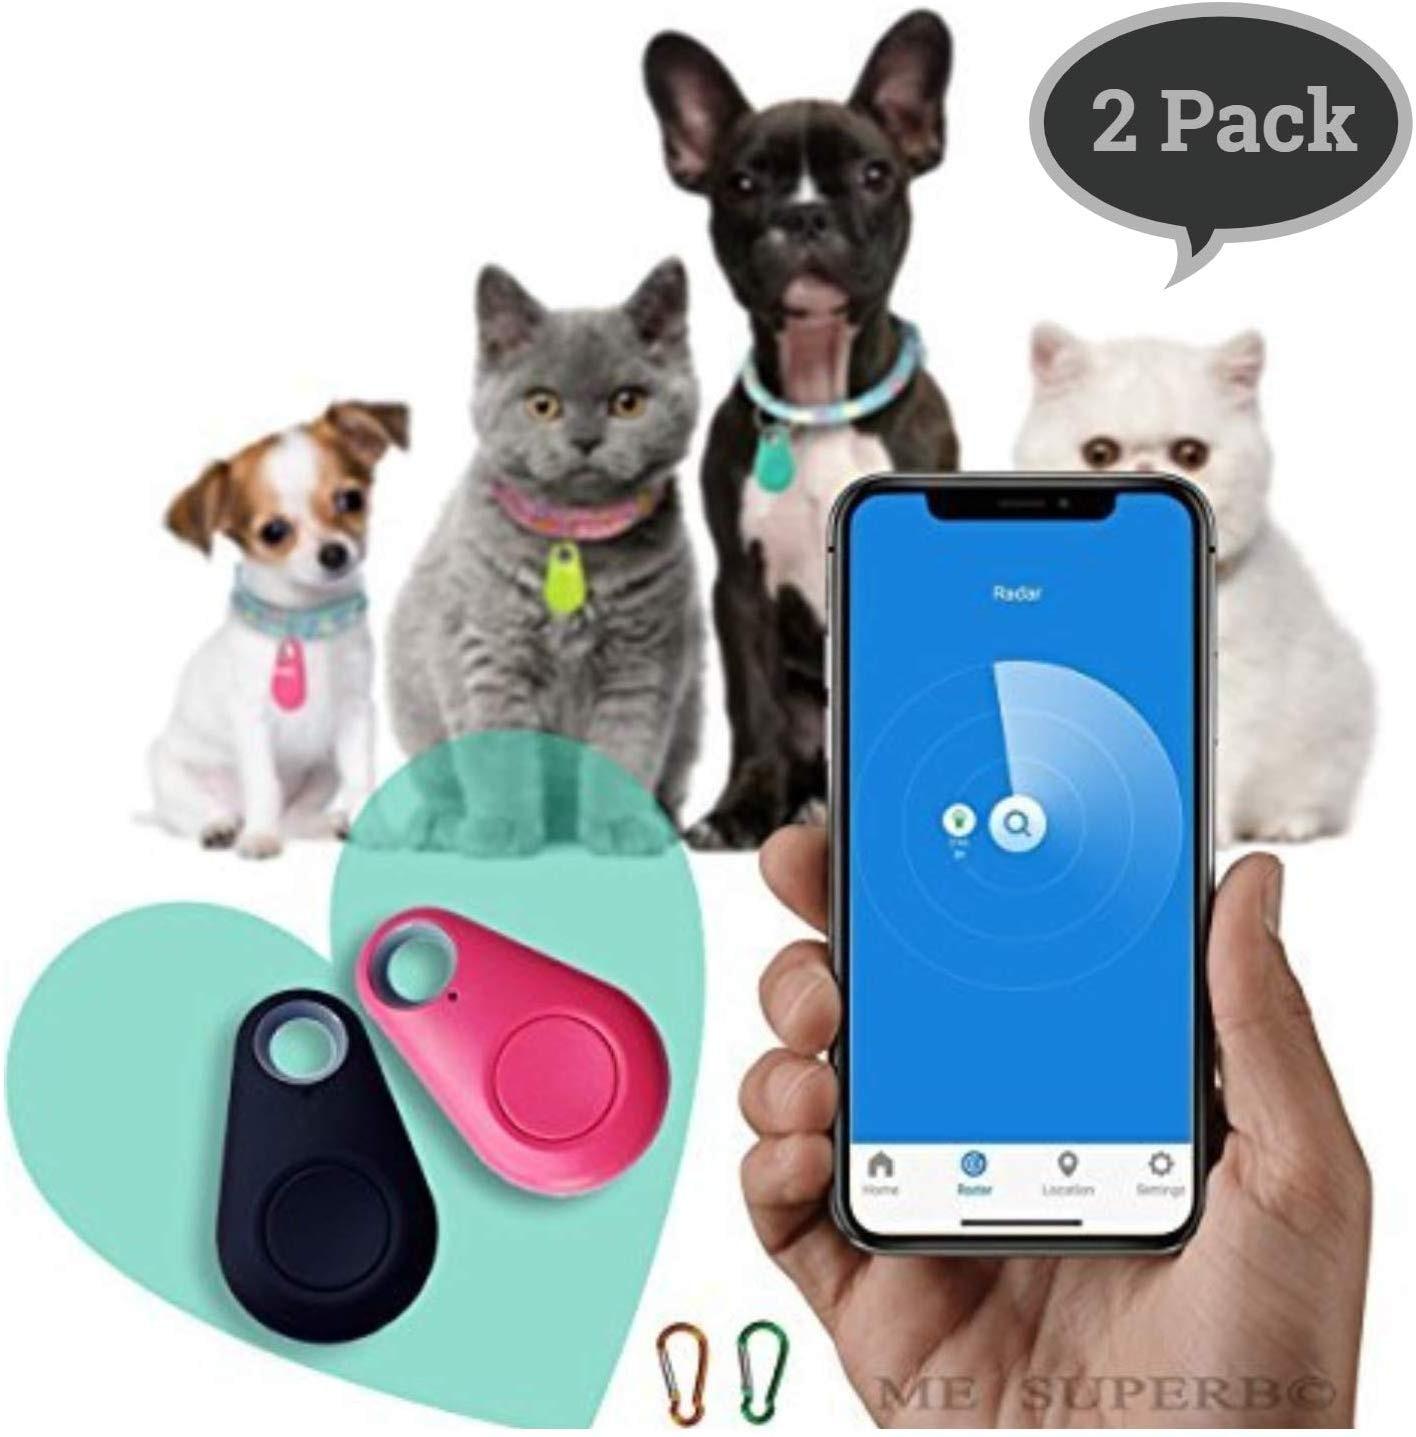 Water Anti Drop Device with Bluetooth GPS Locator Alarm Locator Finder Tracker Mobile Phone Two-Way Alarm Pet Child Key Anti-Lost Black